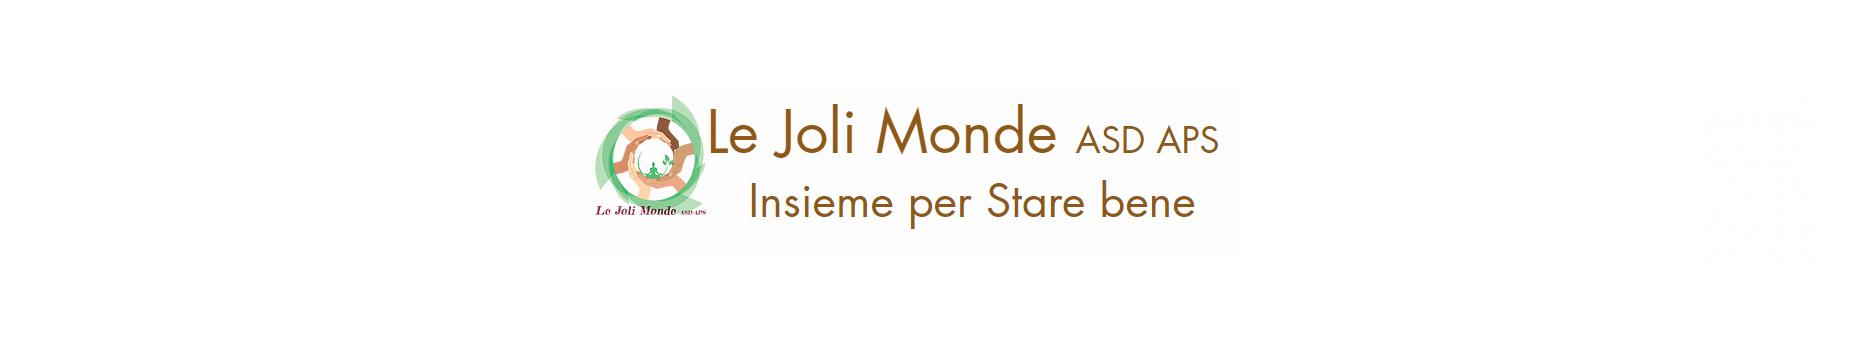 Associazione Le Joli Monde APS ASD logo